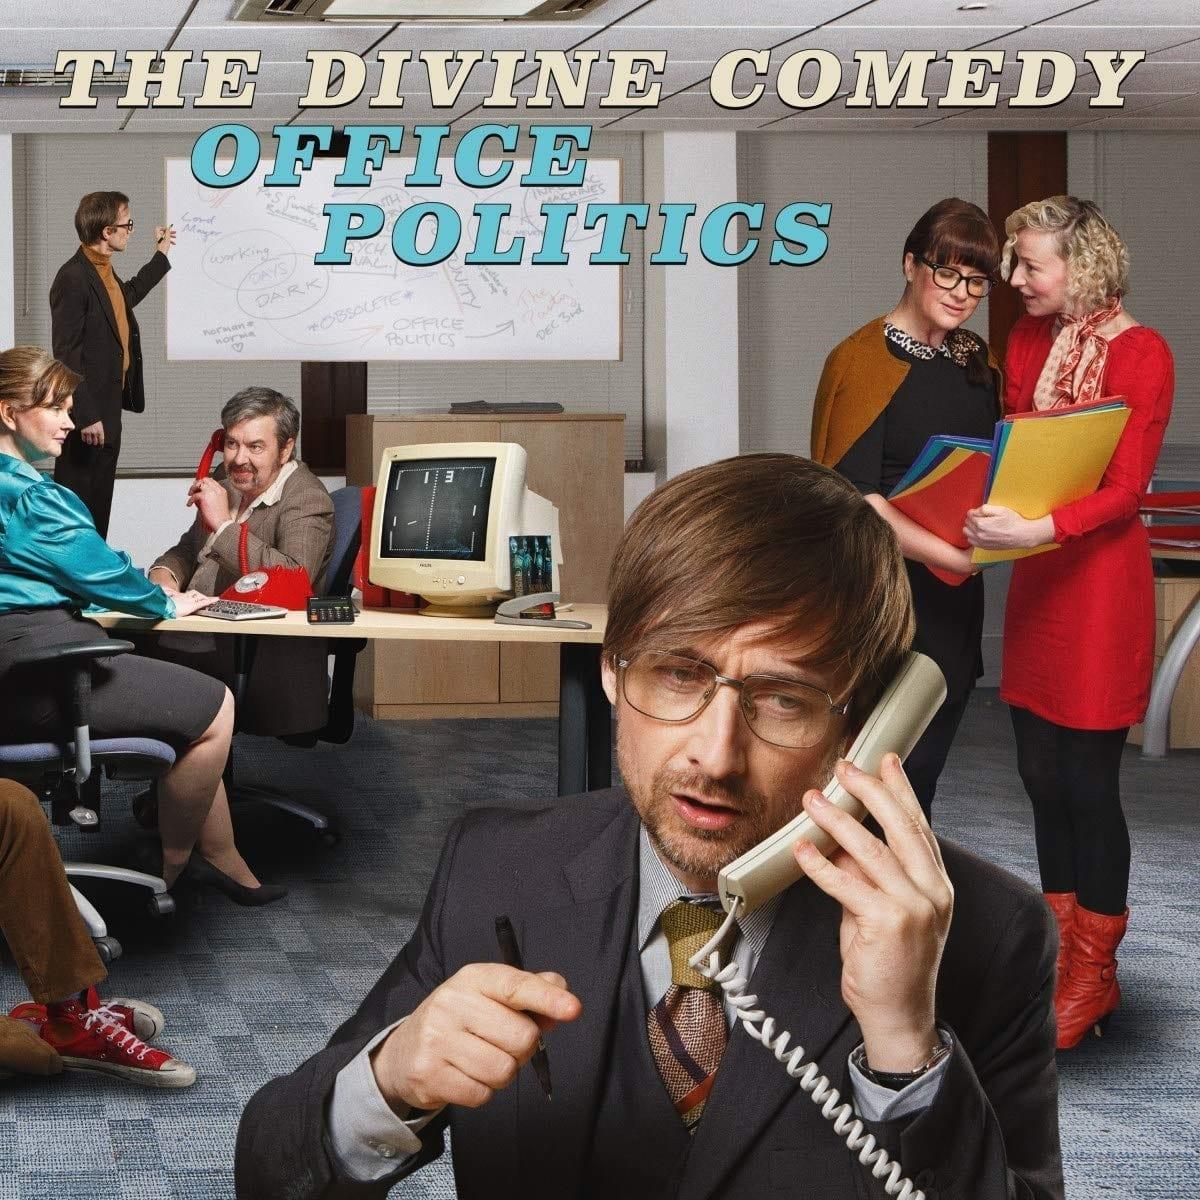 The Divine Comedy album Office Politics pop